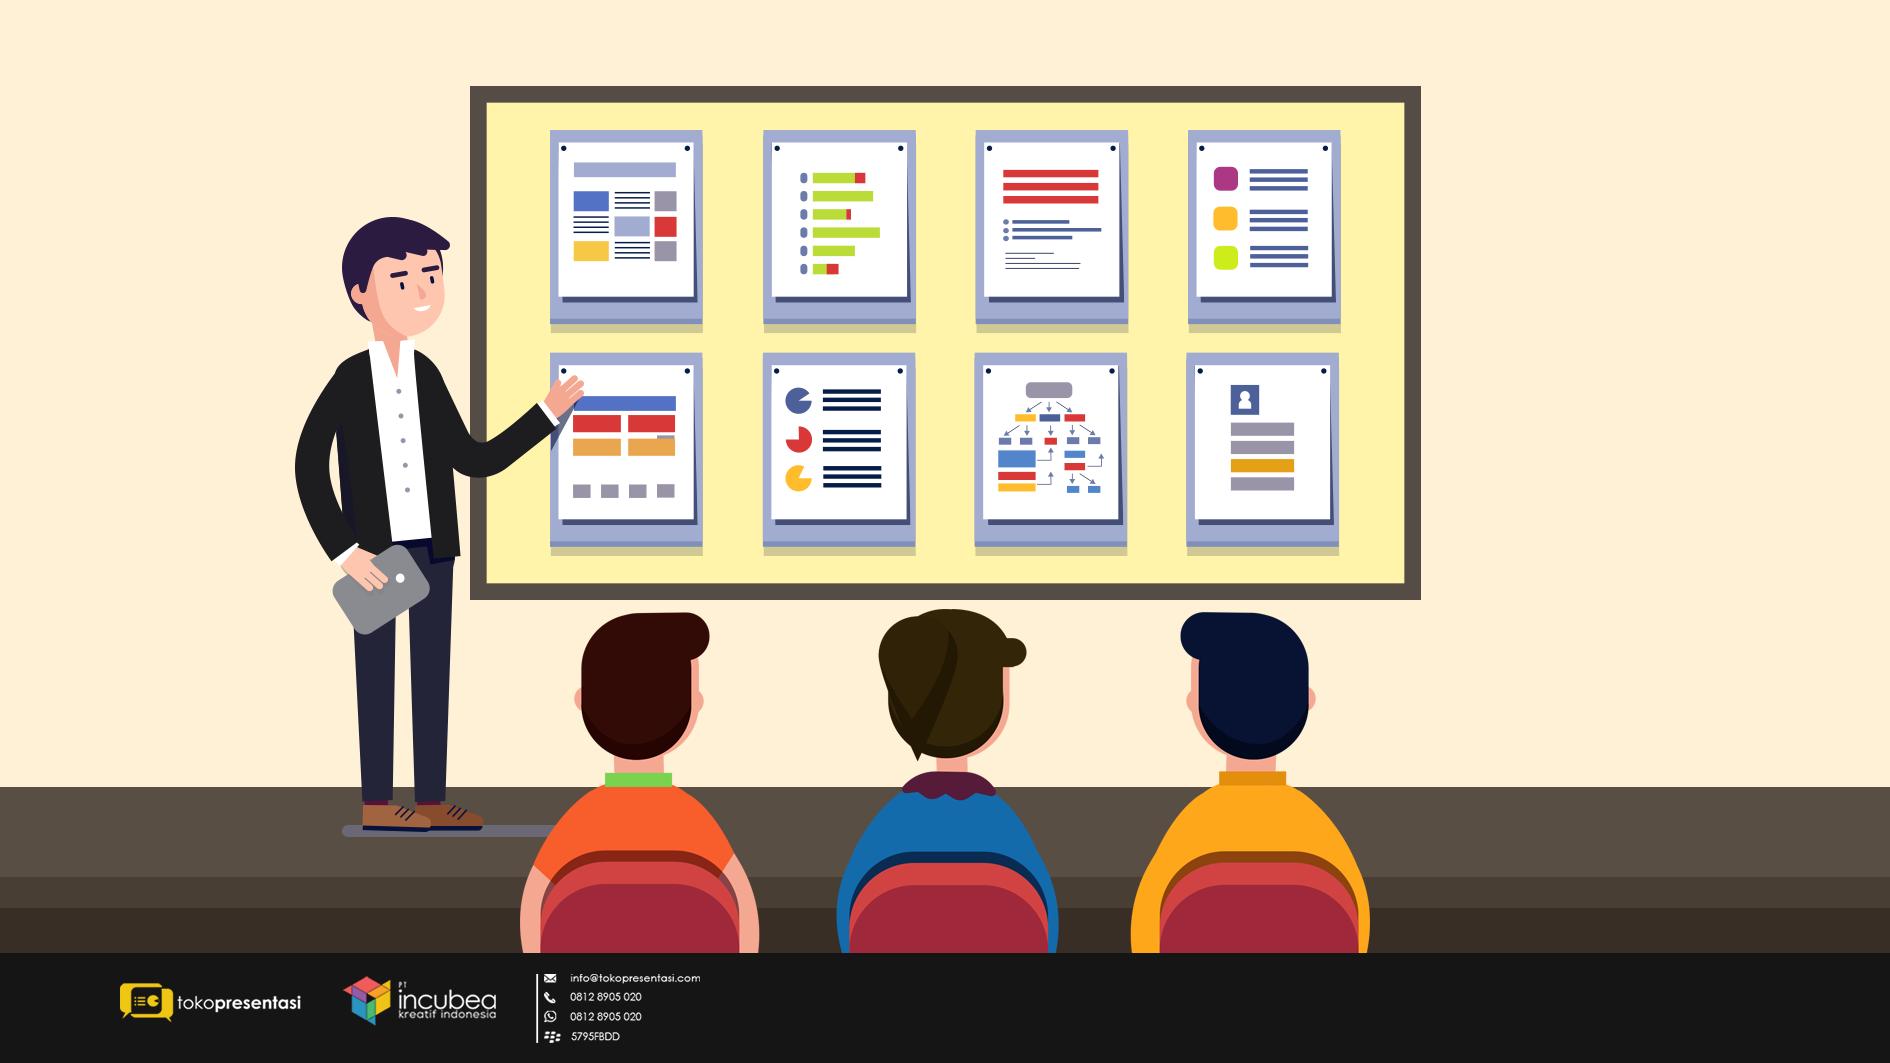 Jasa Pembuatan Presentasi Powerpoint Perusahaan - Tokopresentasi